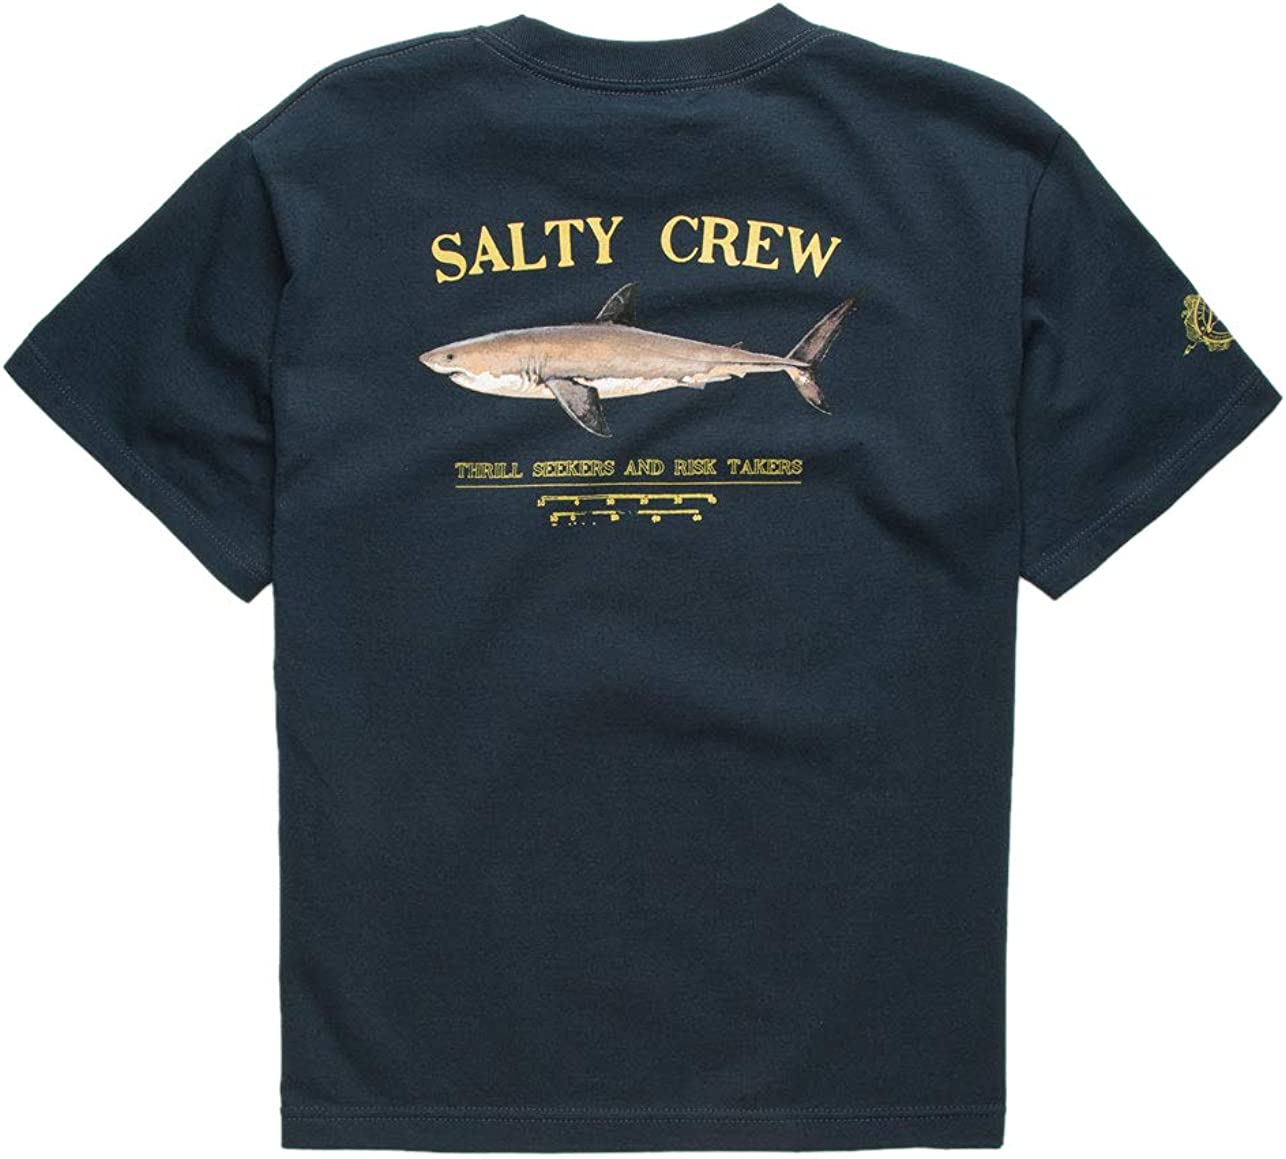 Big Kids Salty Crew Kids Boys Bruce Short Sleeve Tee Black XL Little Kids//Big Kids